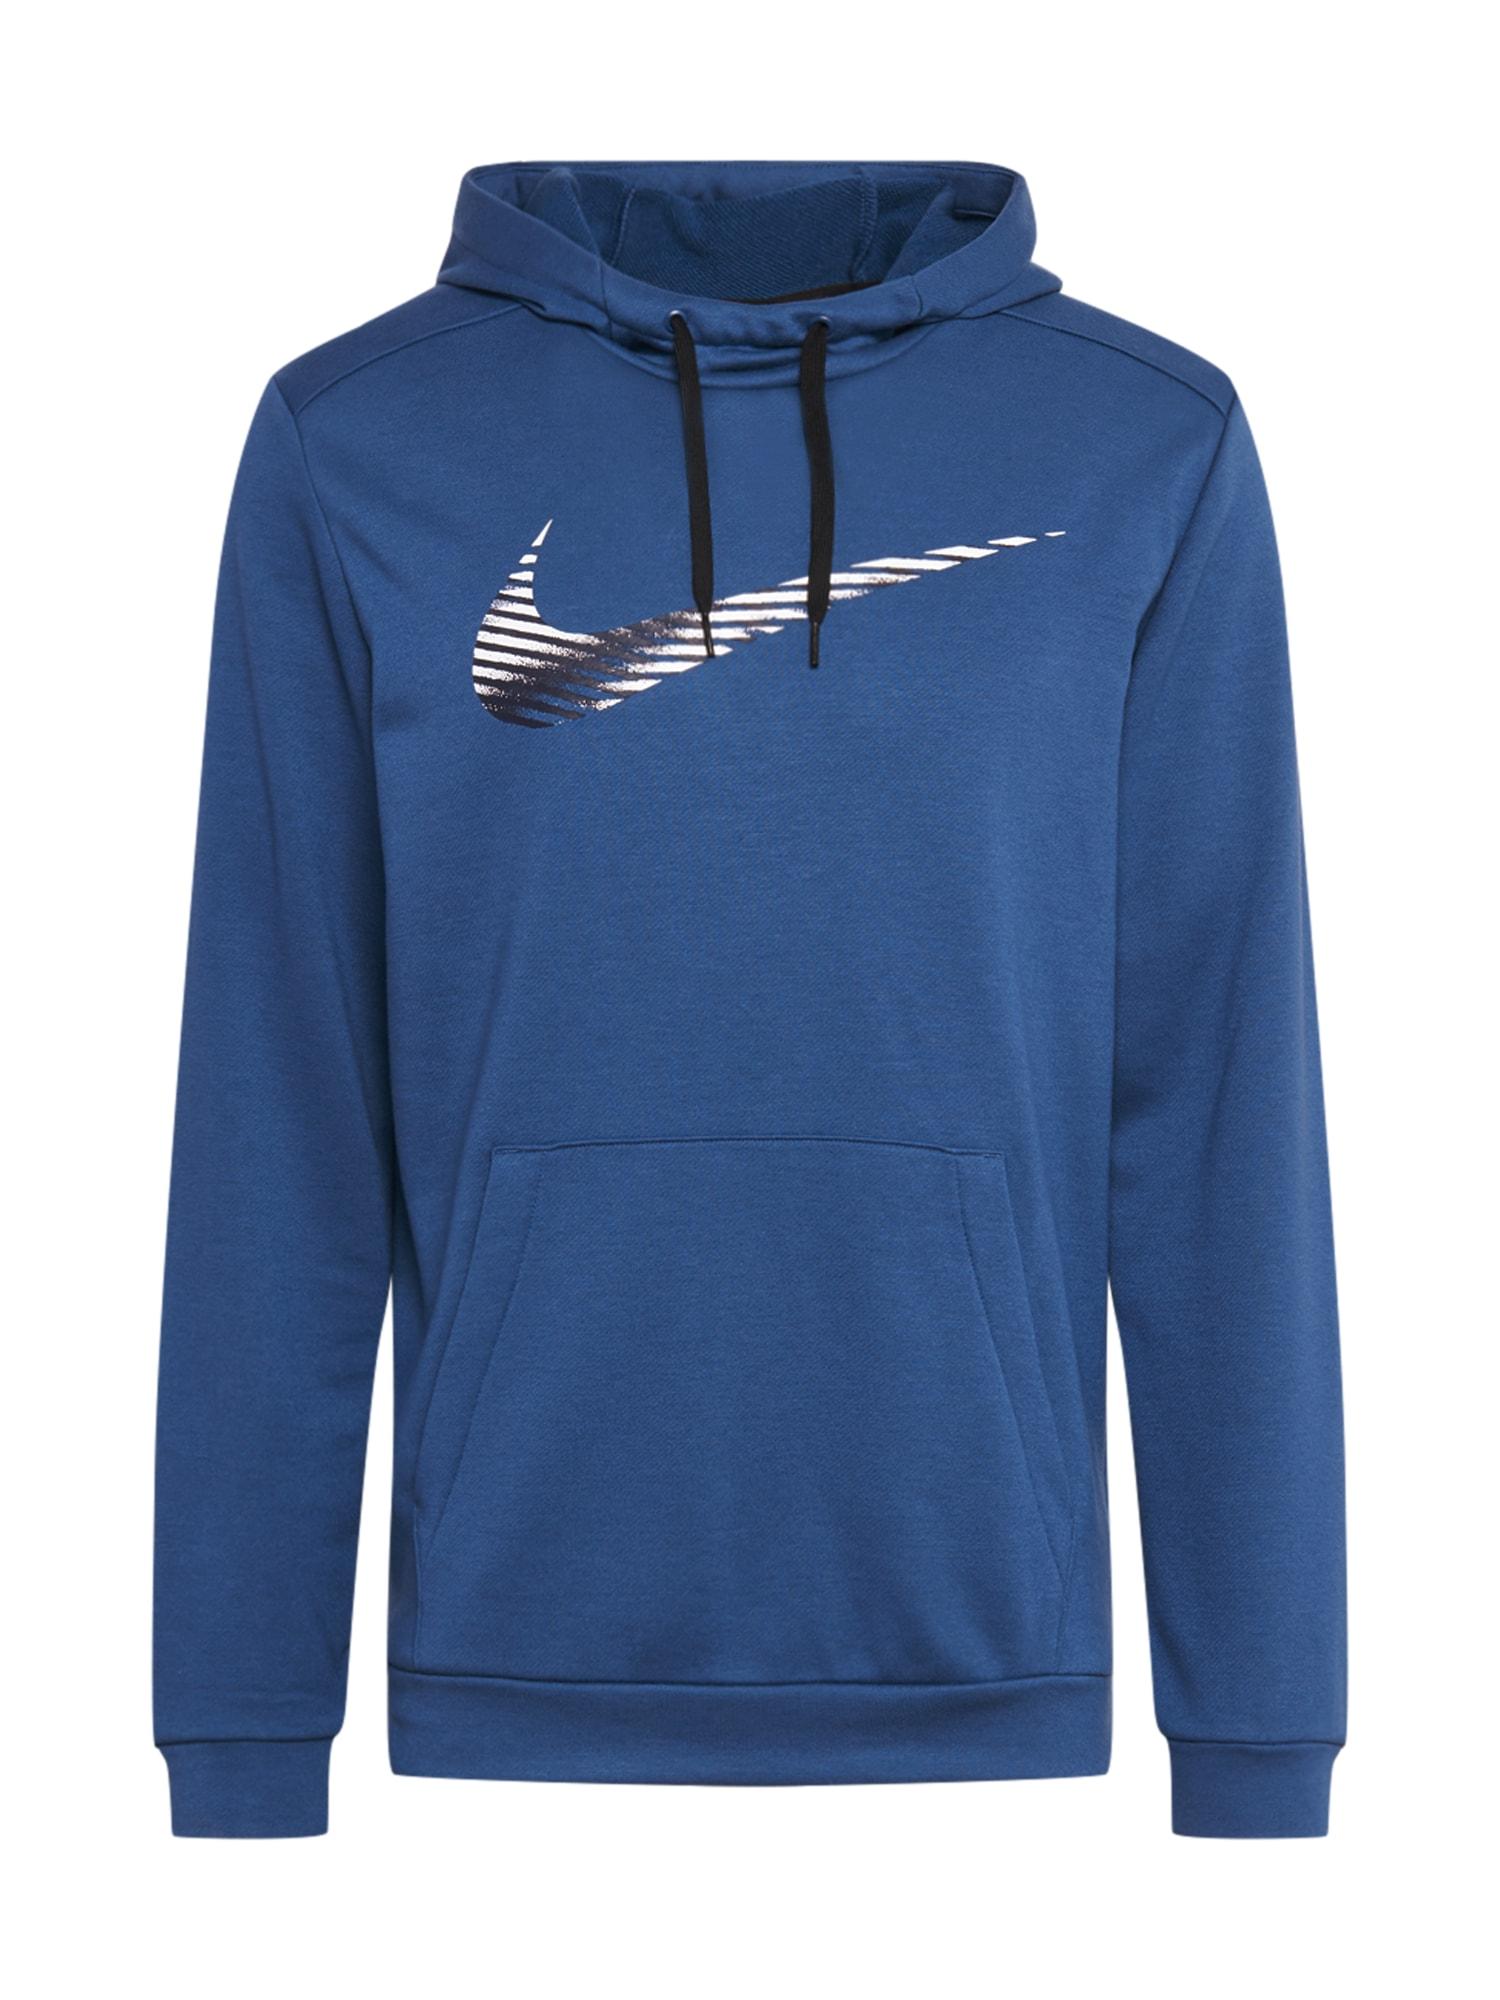 NIKE Sportinio tipo megztinis 'Nike Dri-FIT' tamsiai mėlyna